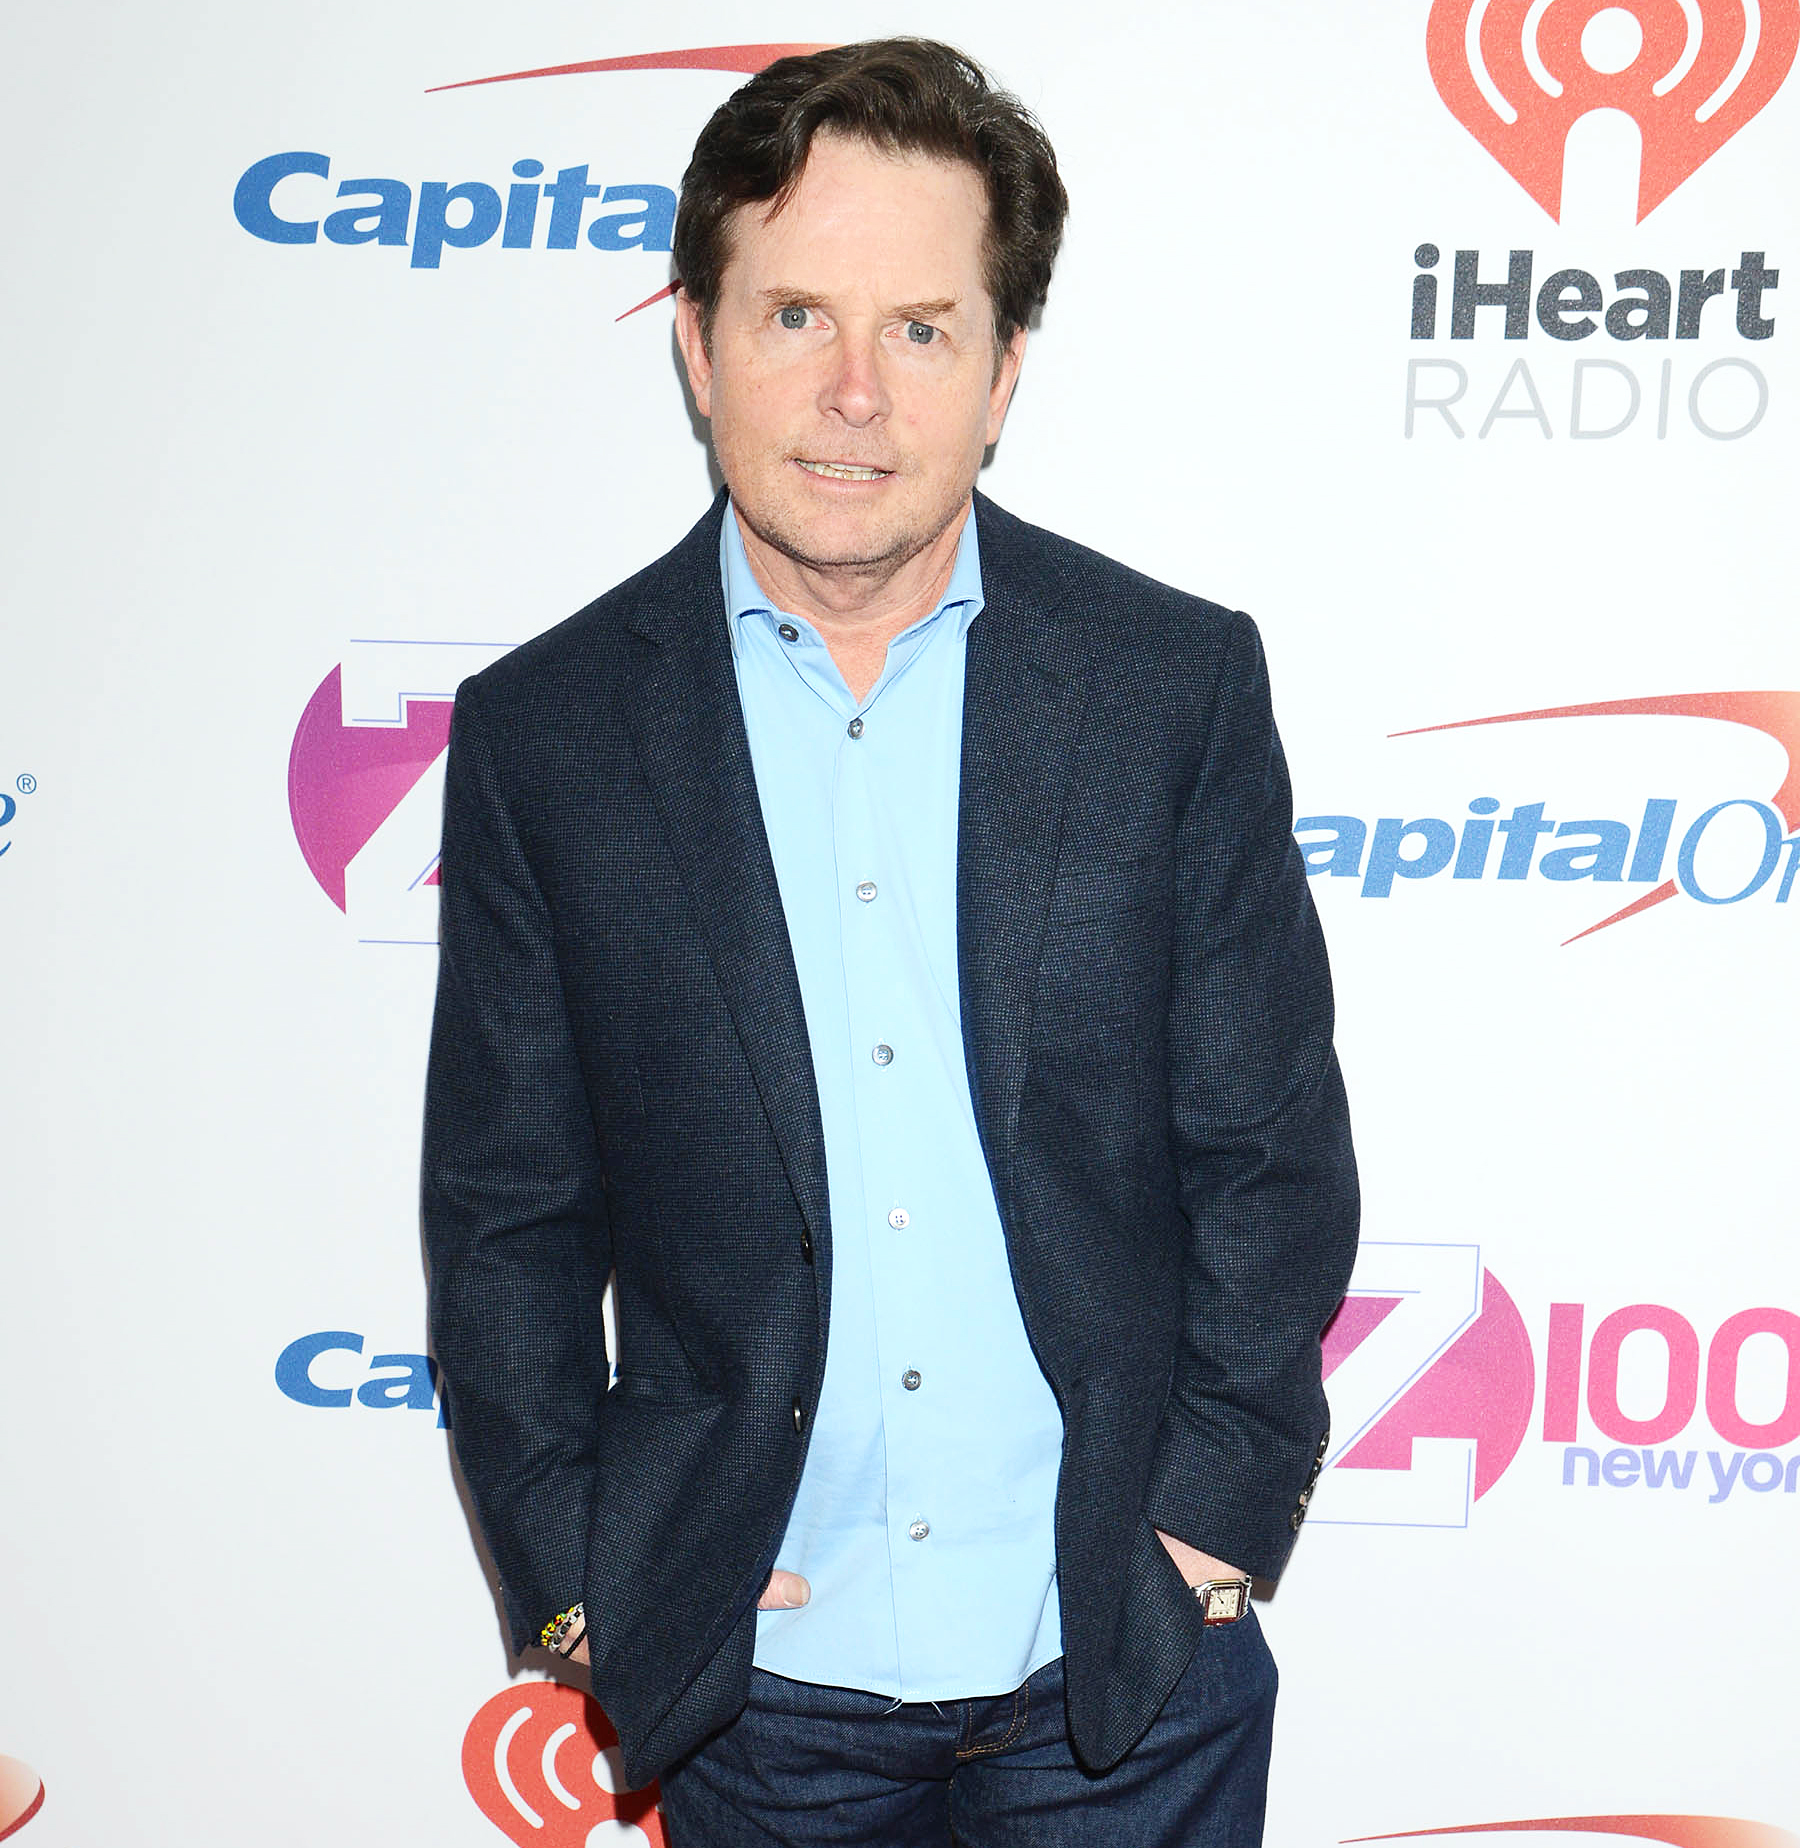 Michael J. Fox Online Death Hoax